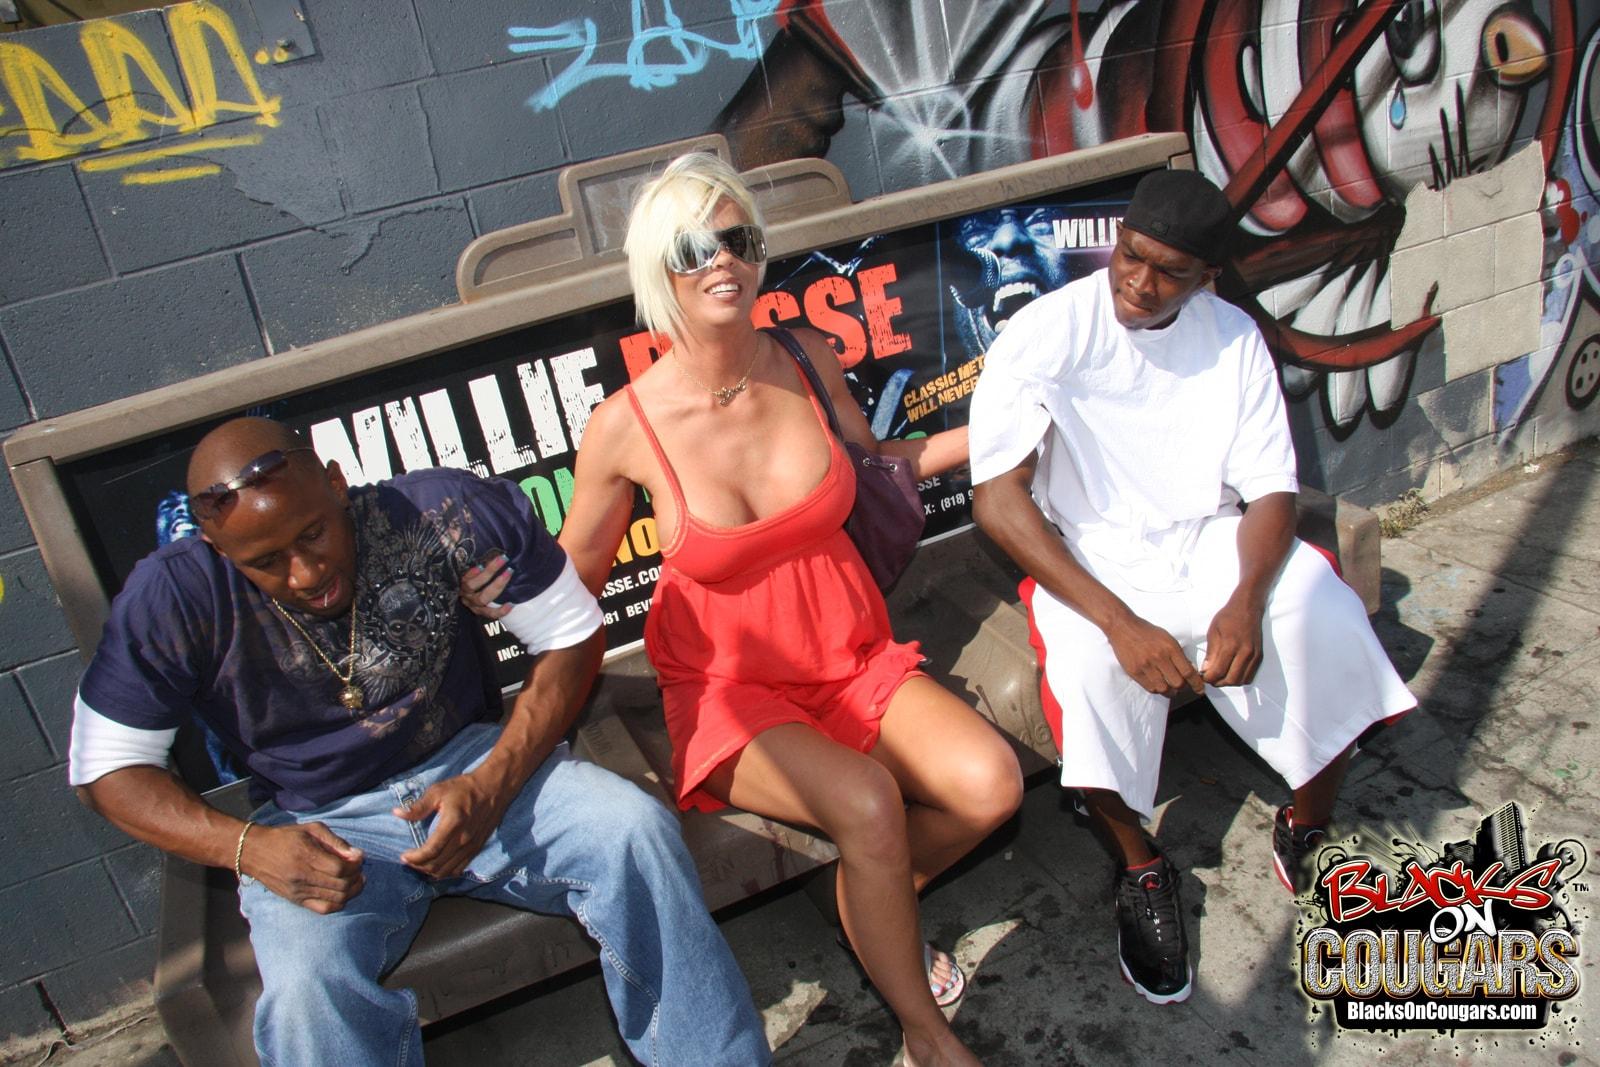 Dogfart '- Blacks On Cougars' starring Jordan Blue (Photo 5)